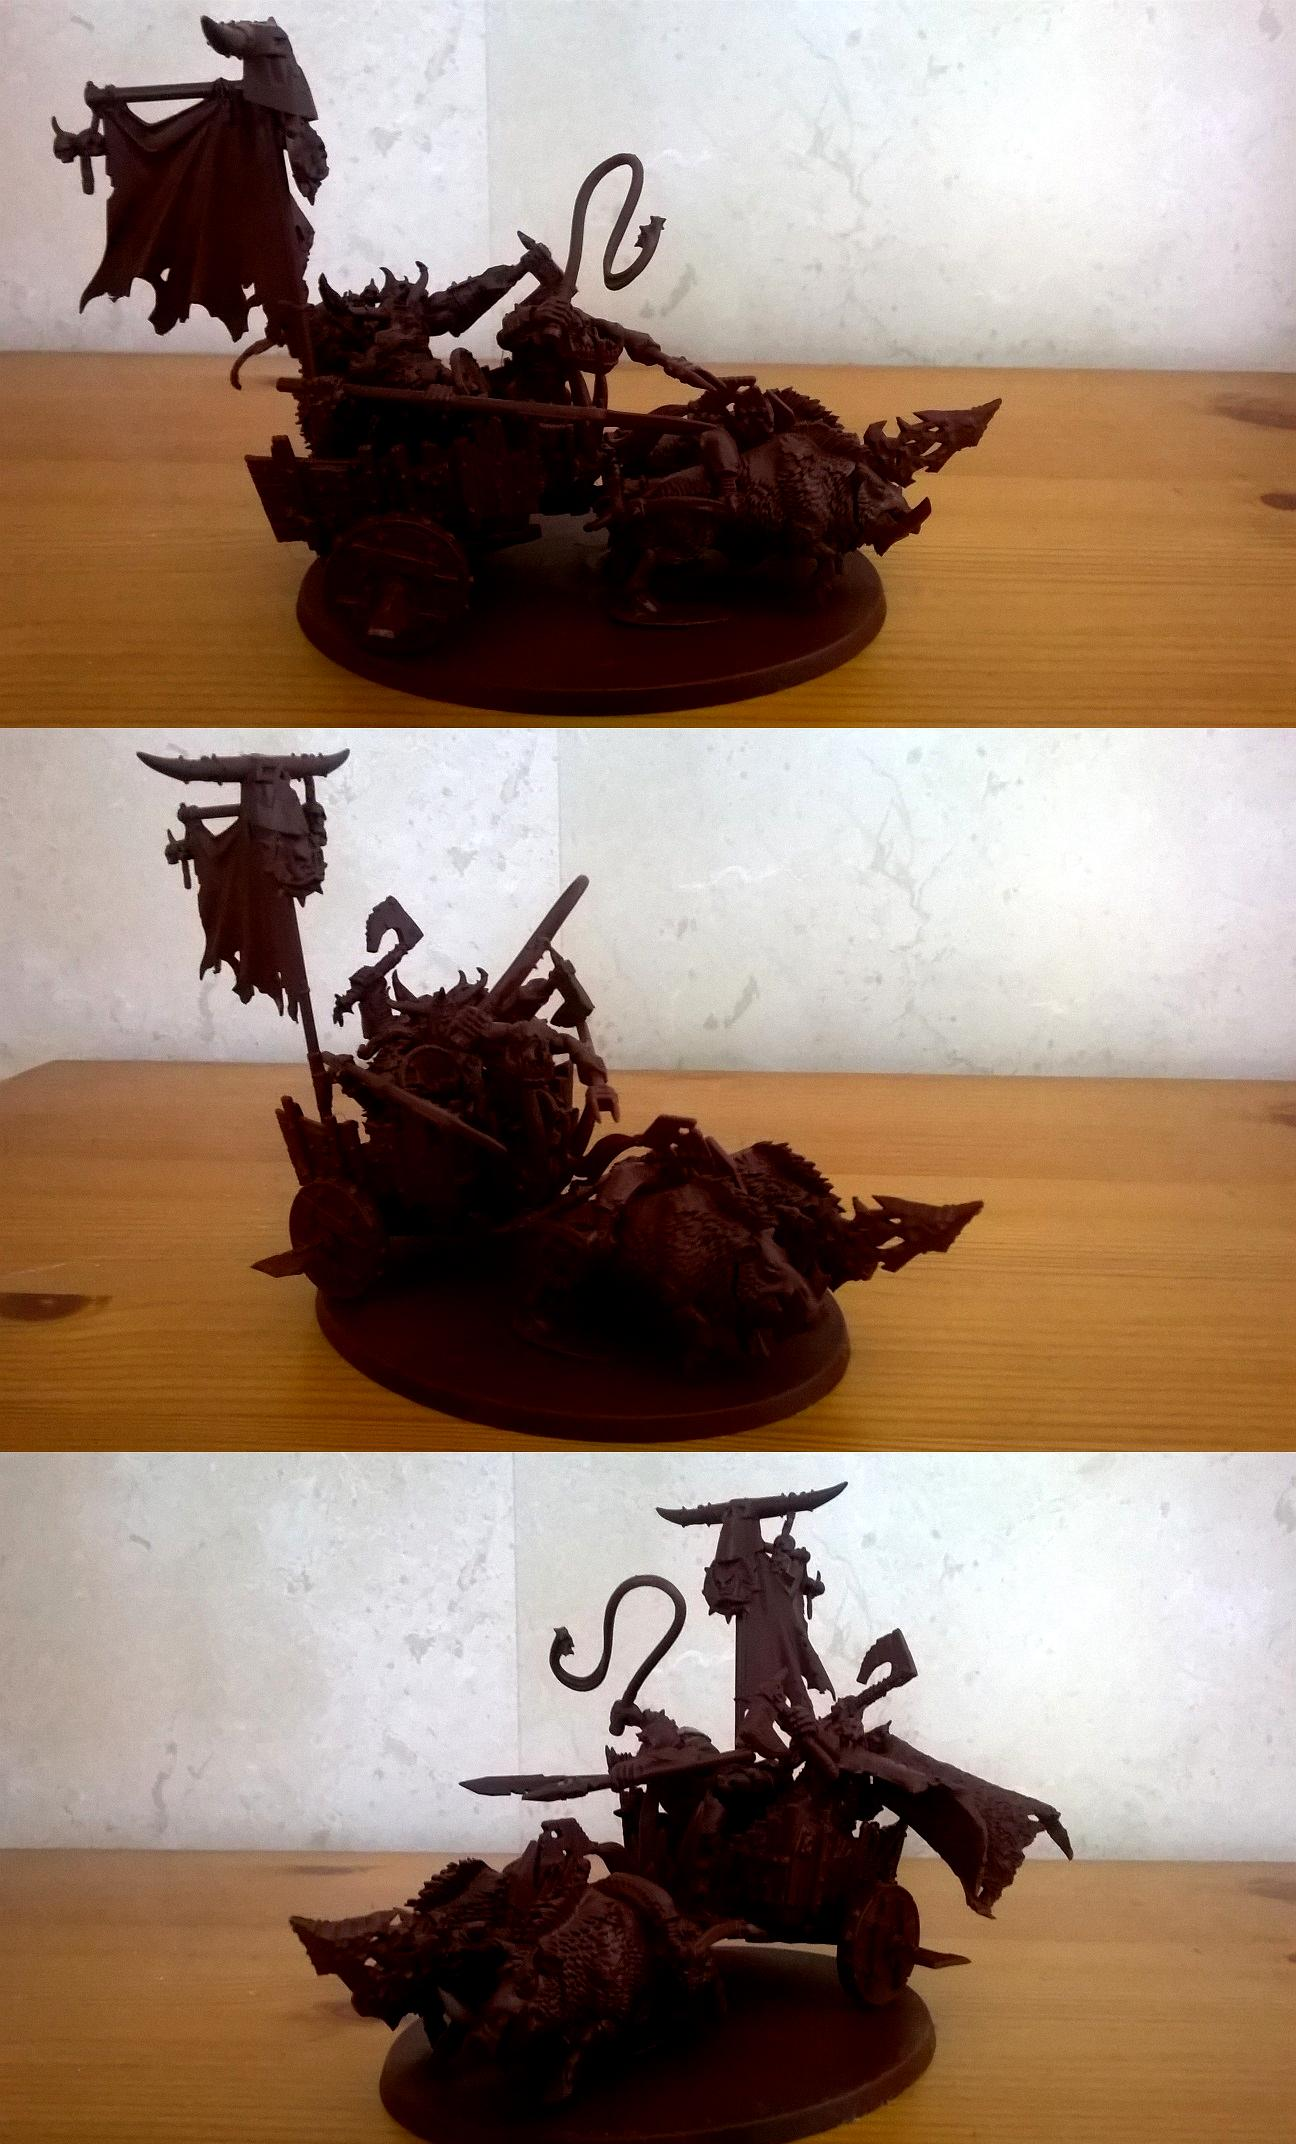 Assault, Black Orc, Boar, Boarboyz, Chariot, Goblins, Greenskinz, Orcs, Waaaghboss, Warhammer Fantasy